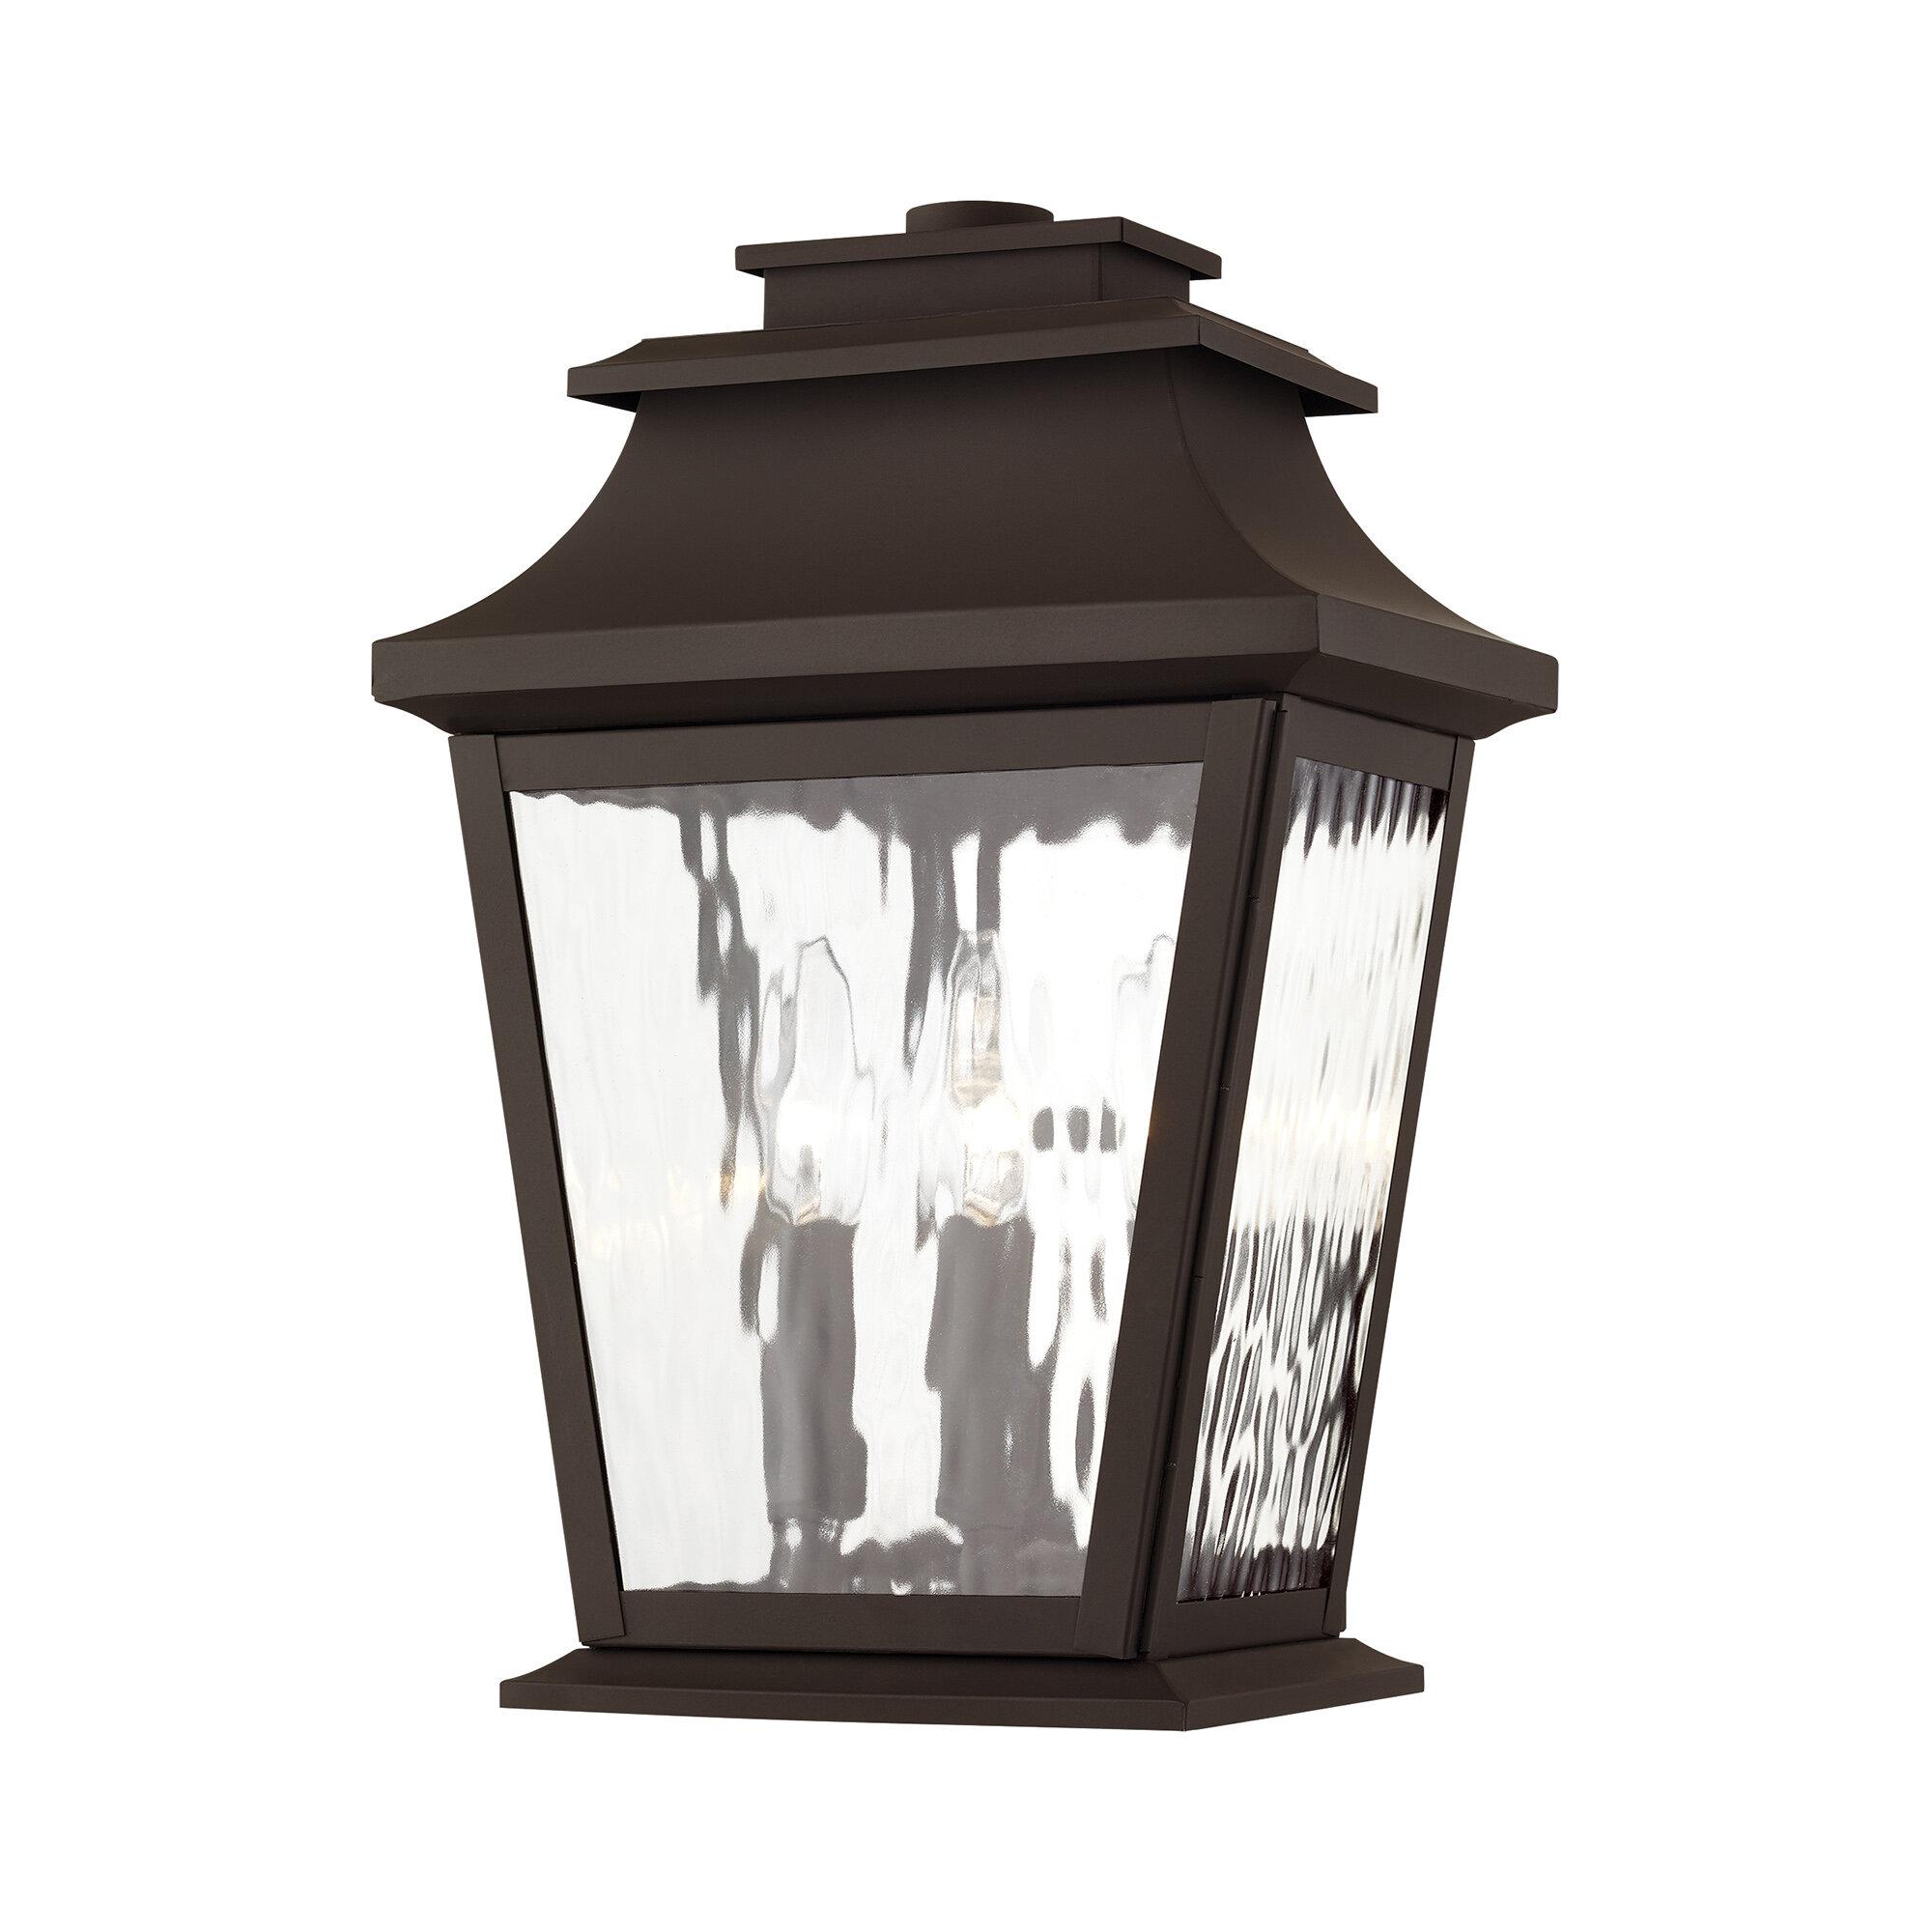 Darby Home Co Campfield 3 Bulb 15 H Outdoor Wall Lantern Wayfair